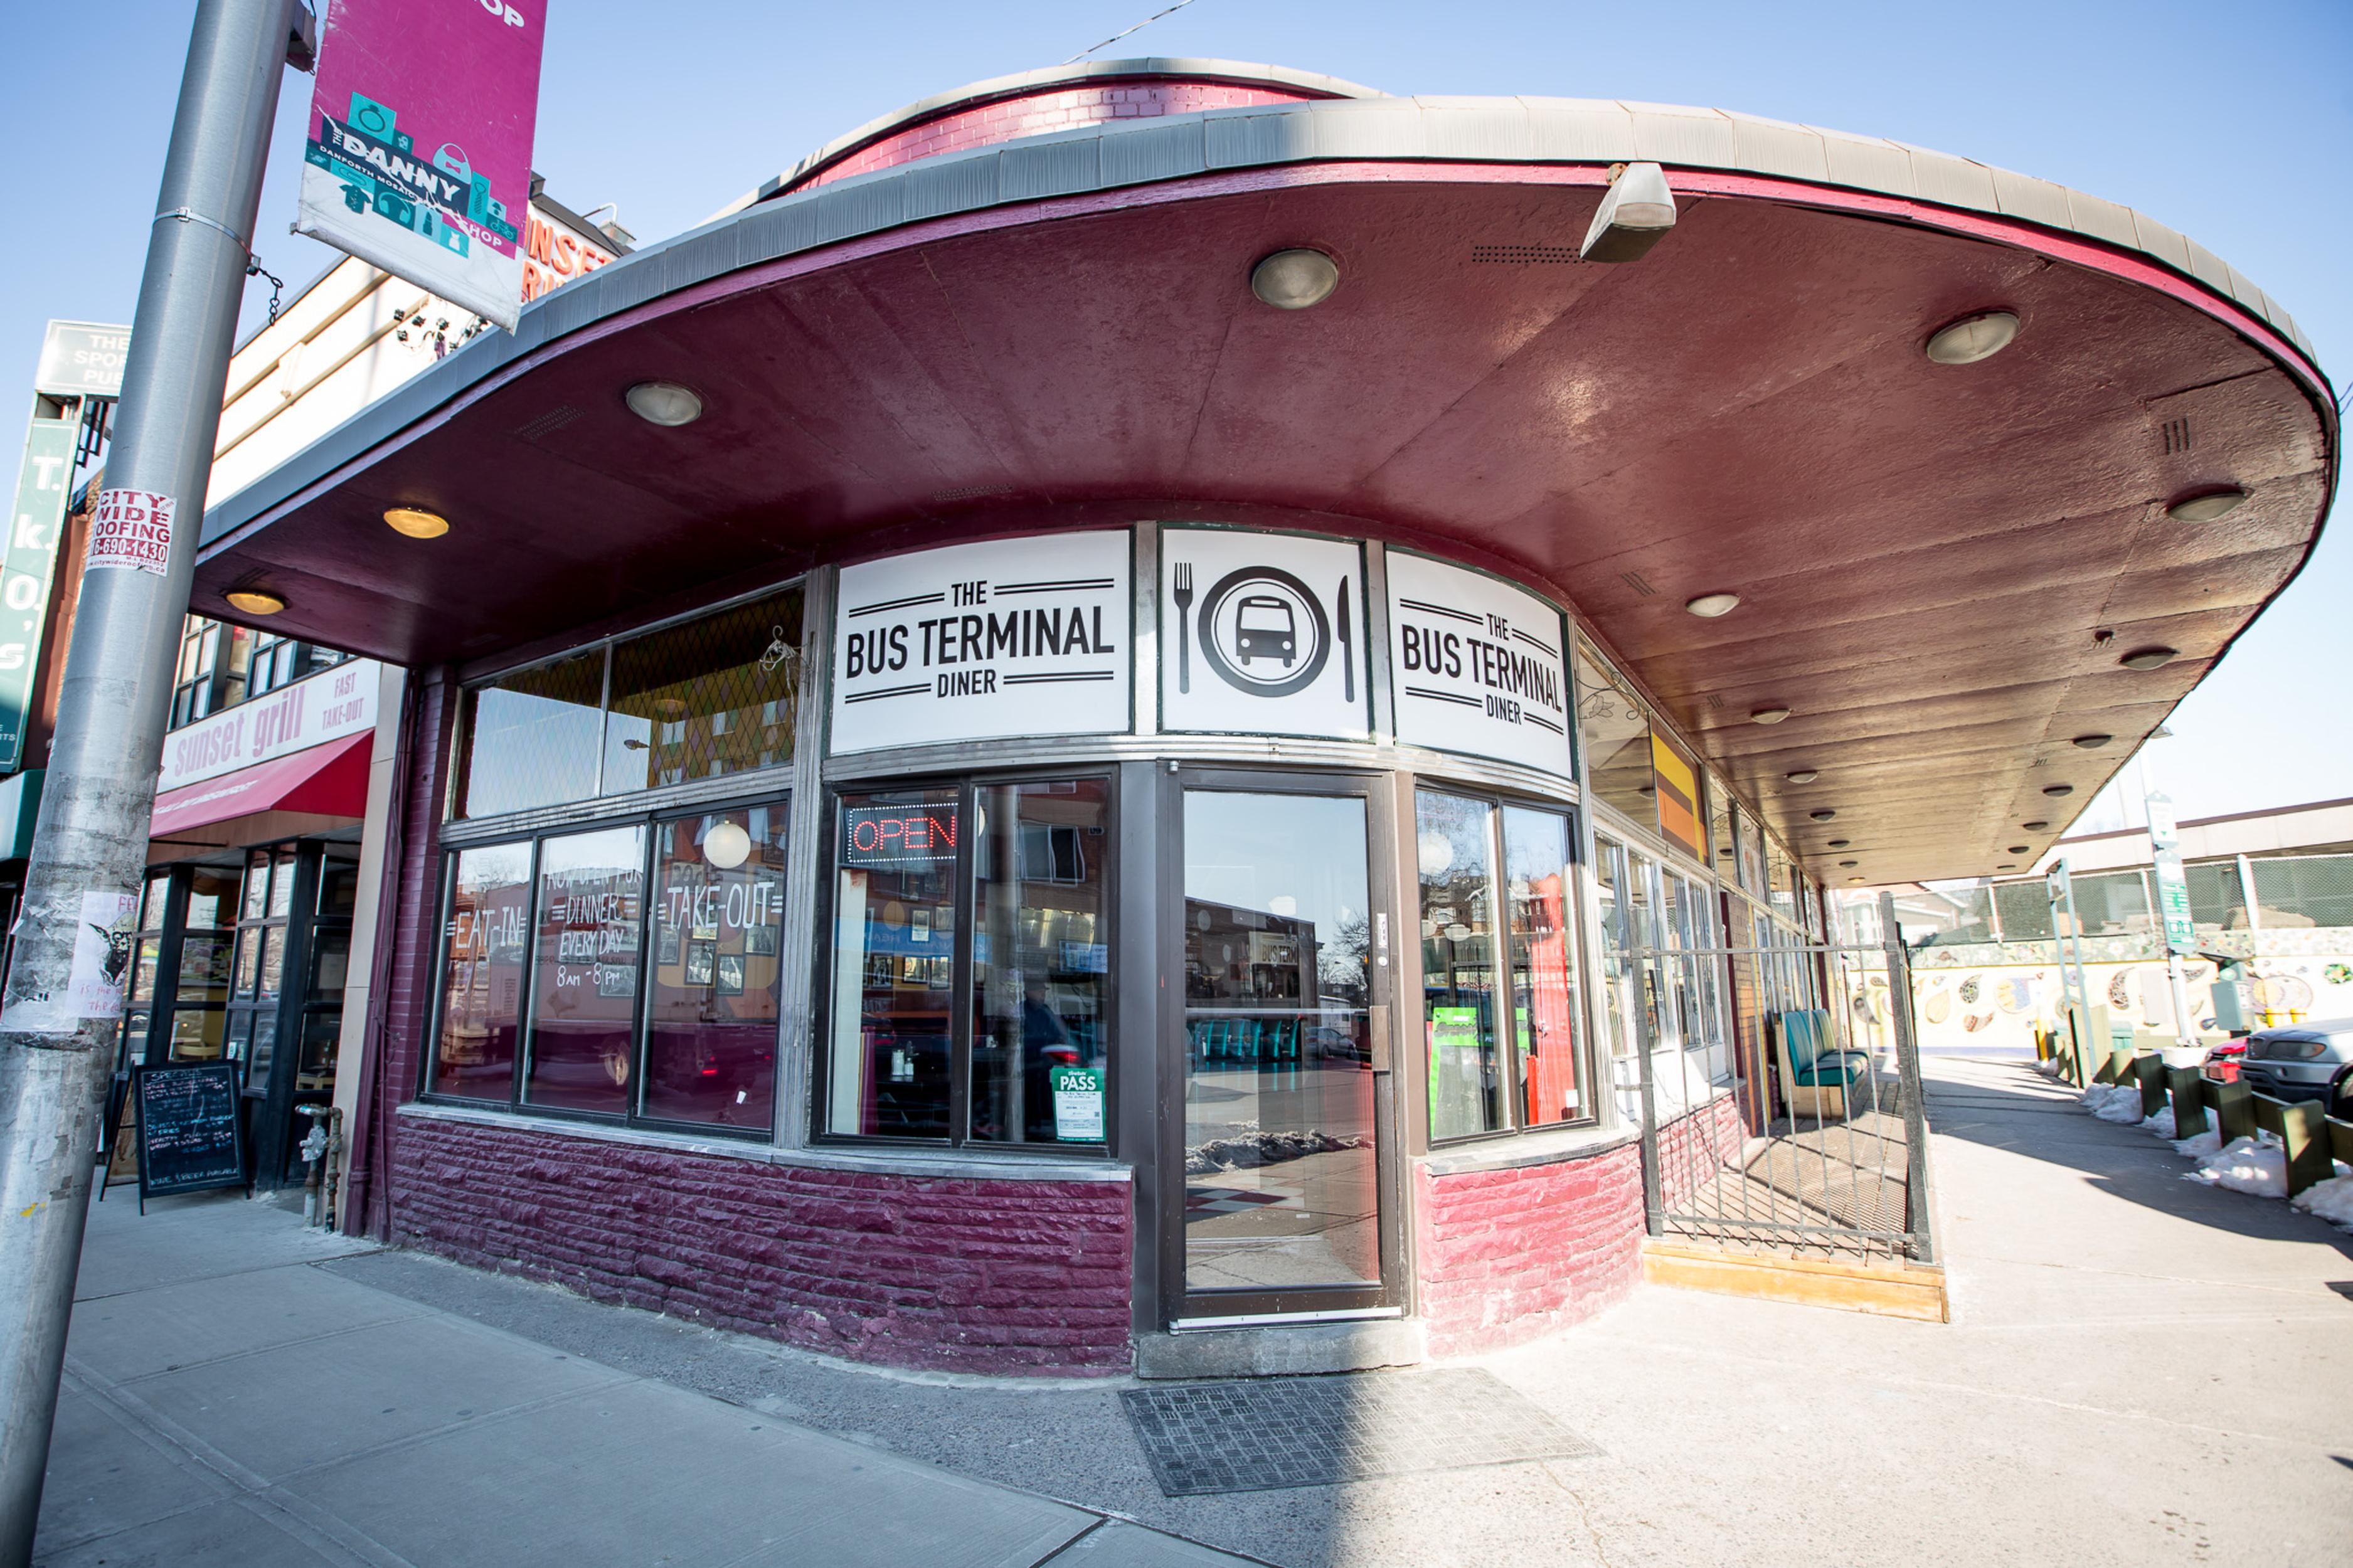 Bus Terminal Diner Toronto